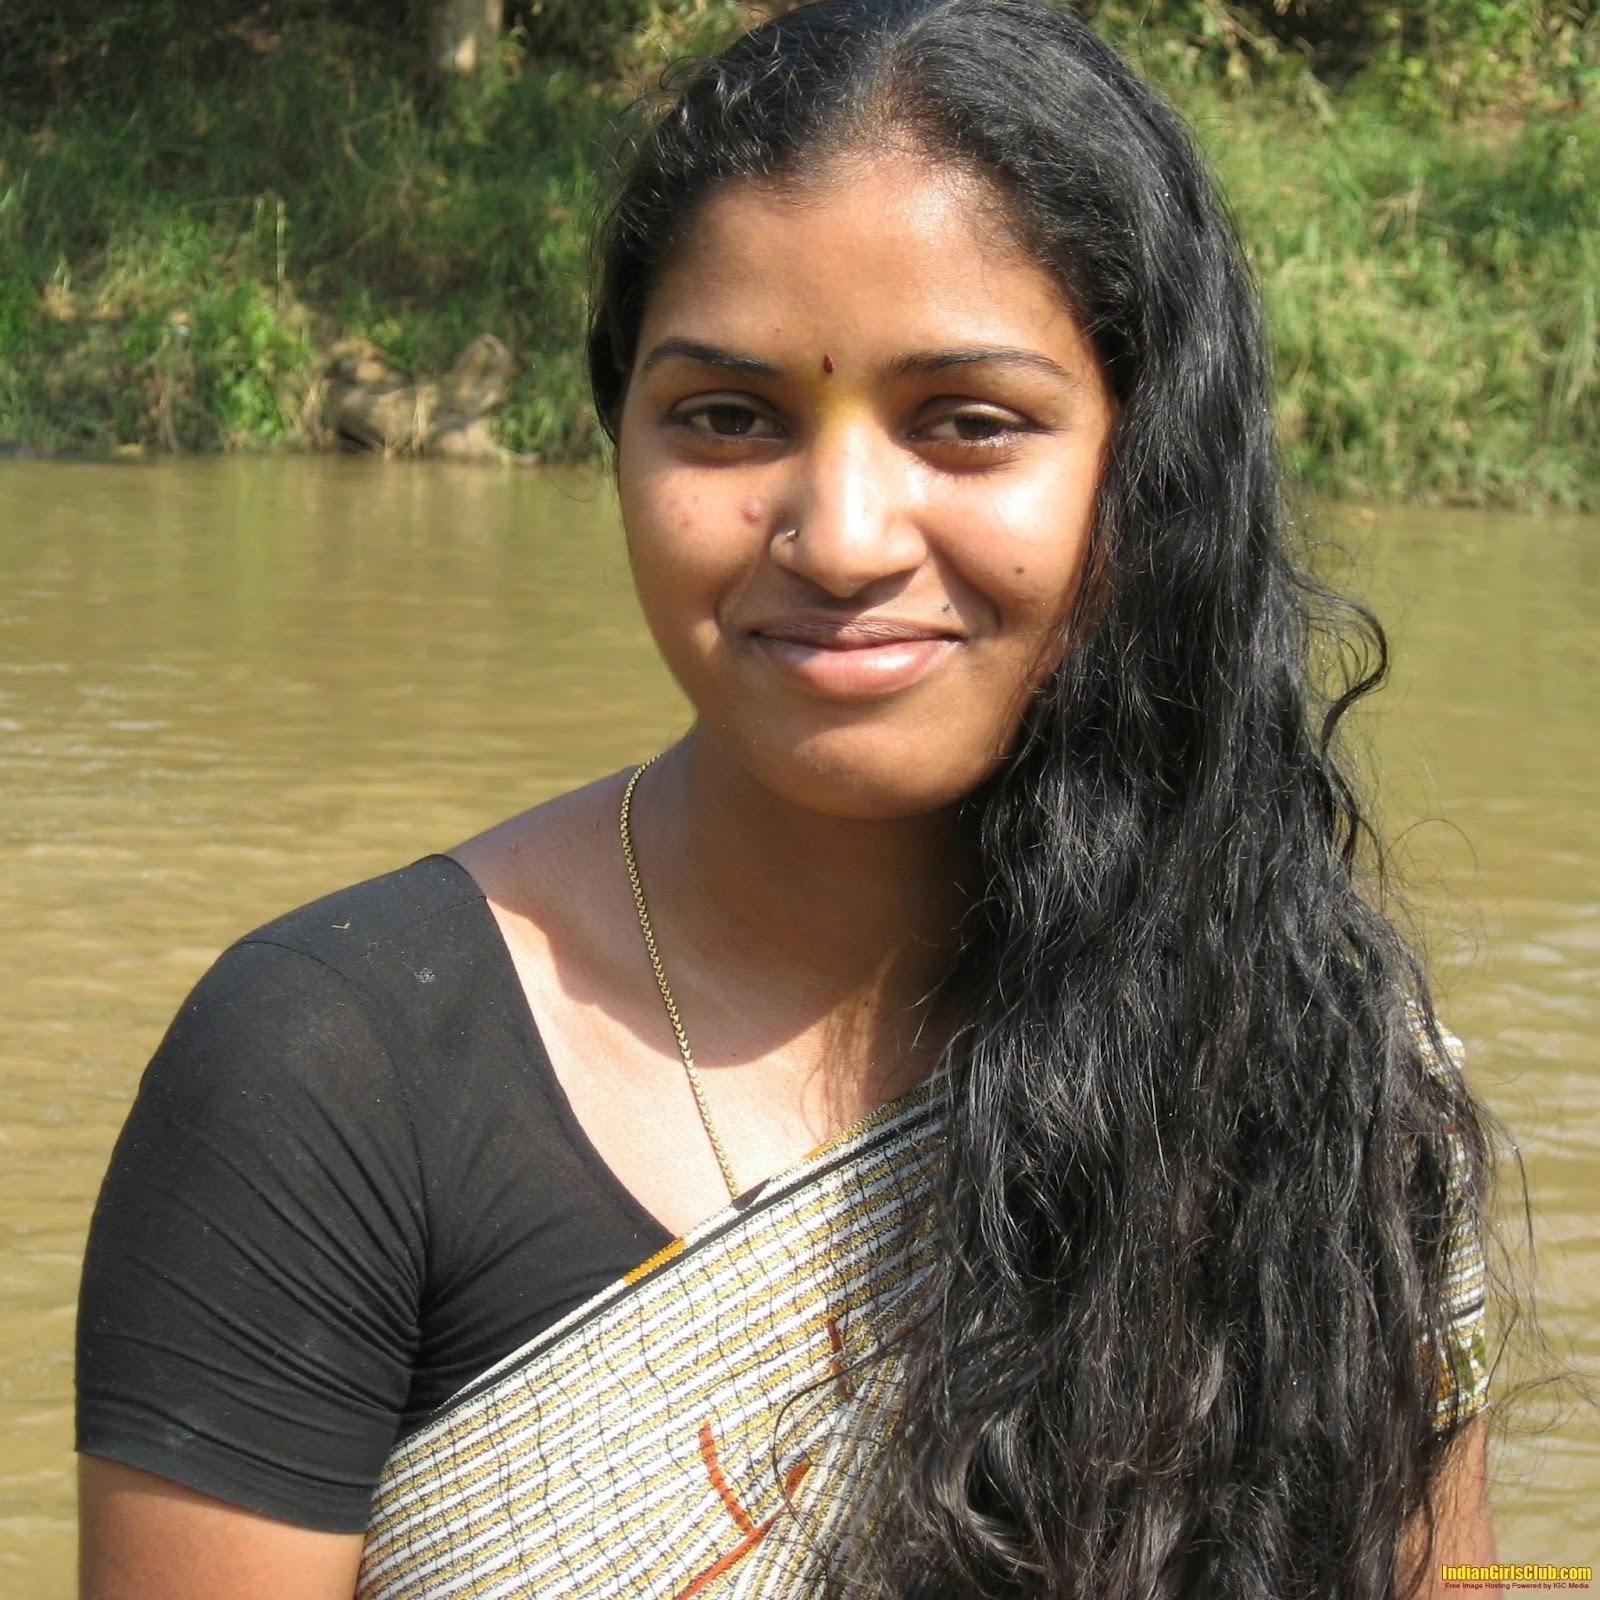 Pics photos kerala chechi mulakal picture - Pics Photos Kerala Chechi Mulakal Picture 20